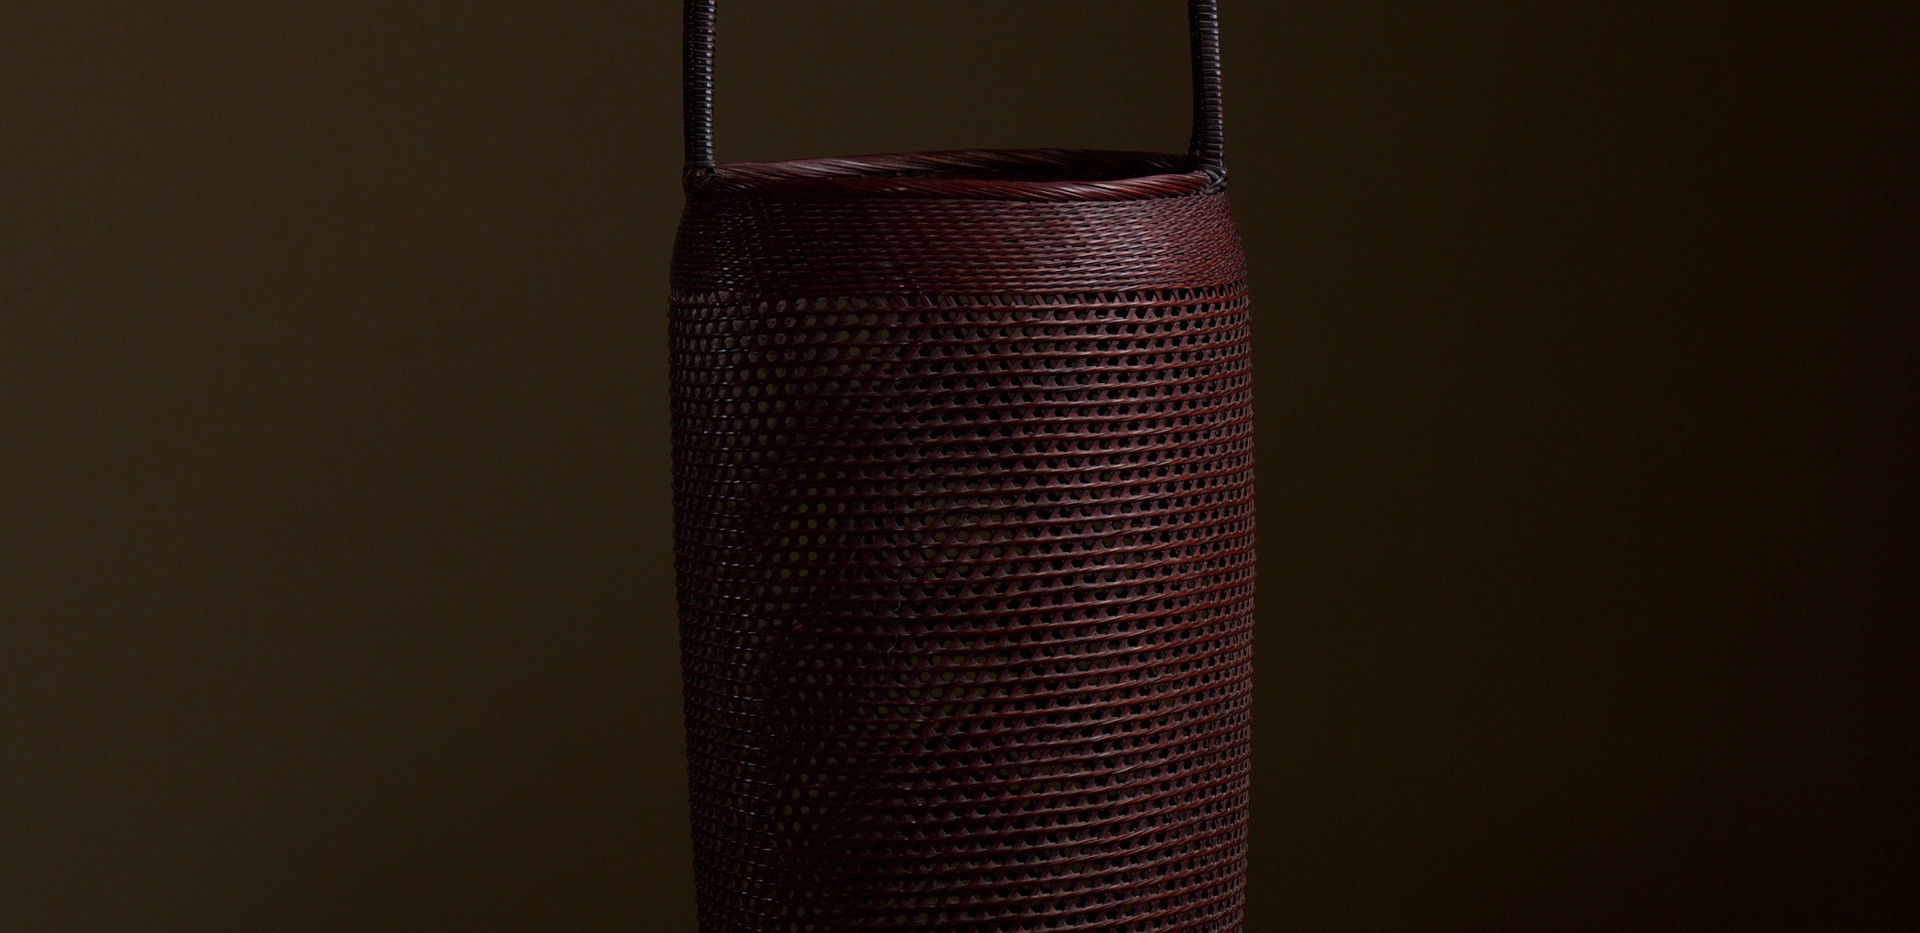 Small Bamboo Flower Basket by Morita Chikuyosai 01.jpg